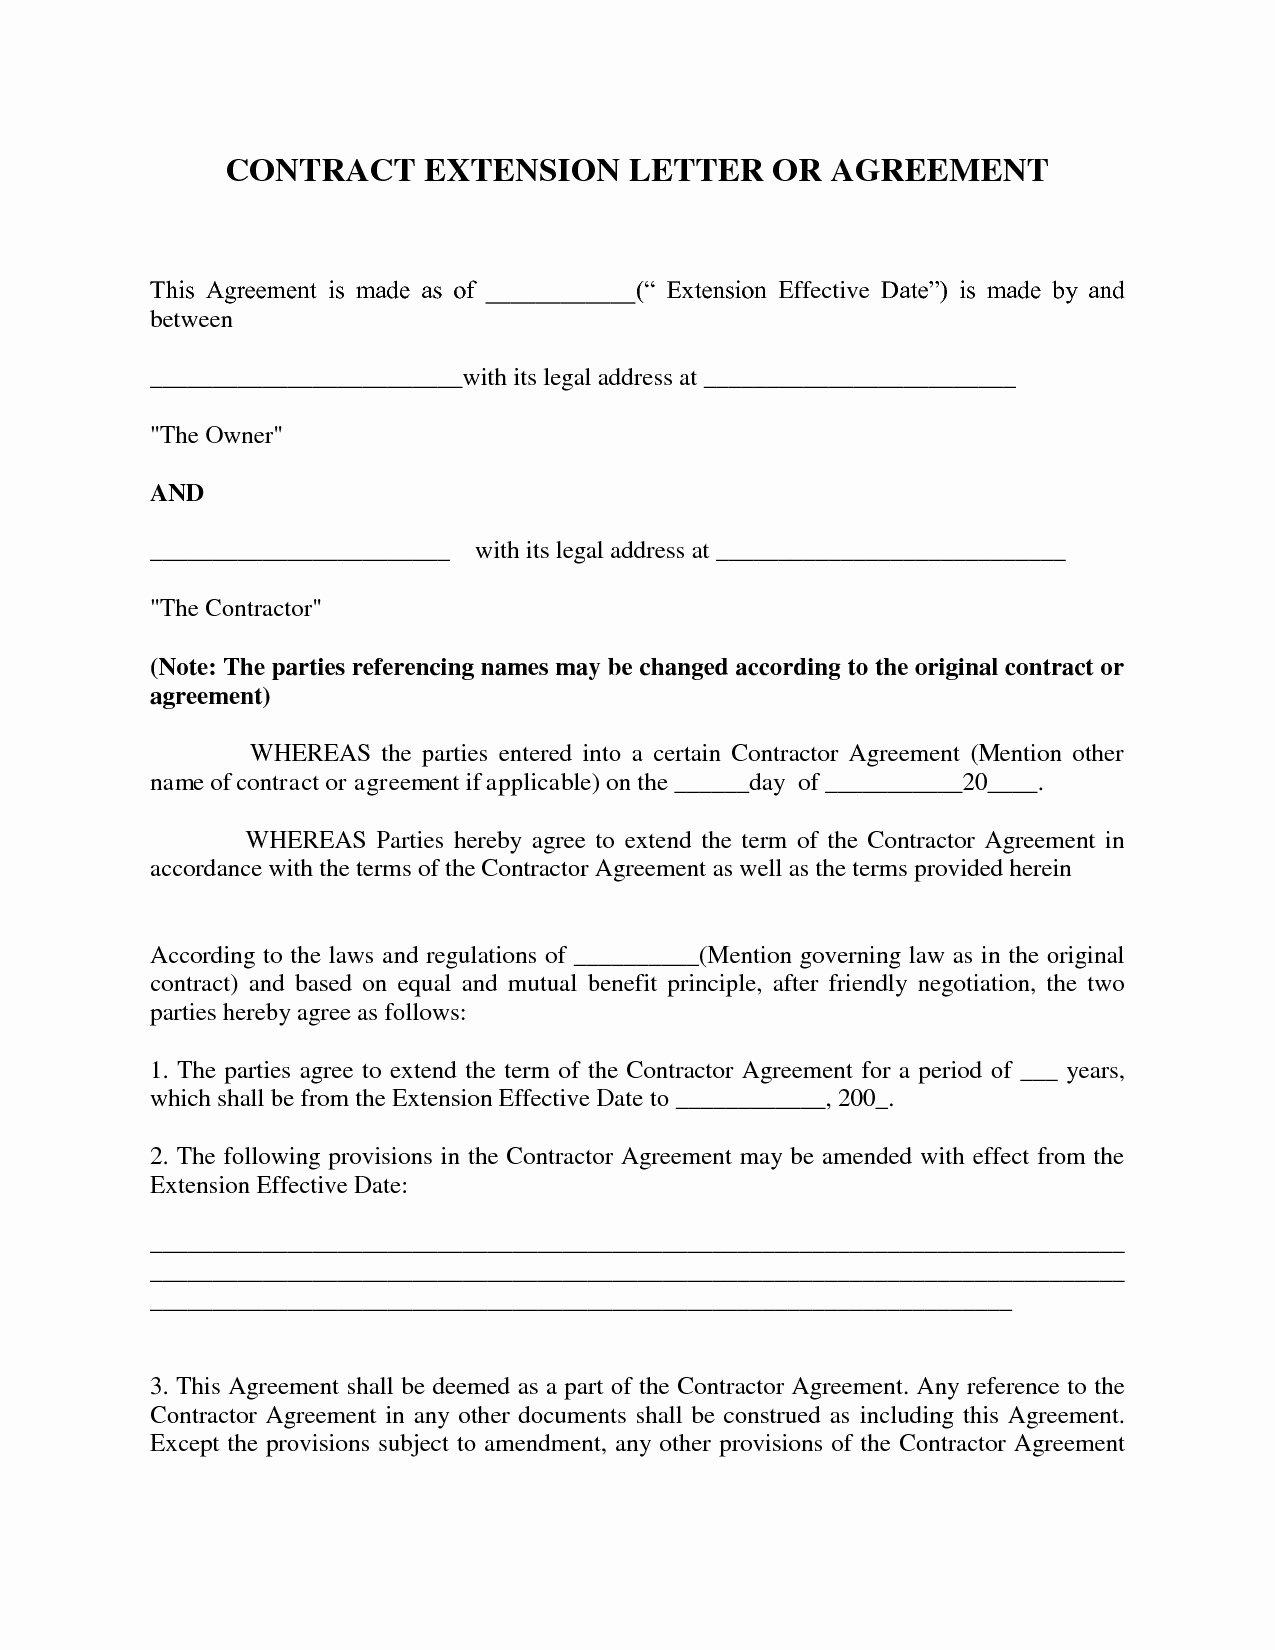 Agreement Template Between Two Parties Elegant Lease Agreement Between Two Parties Expert 10 Best